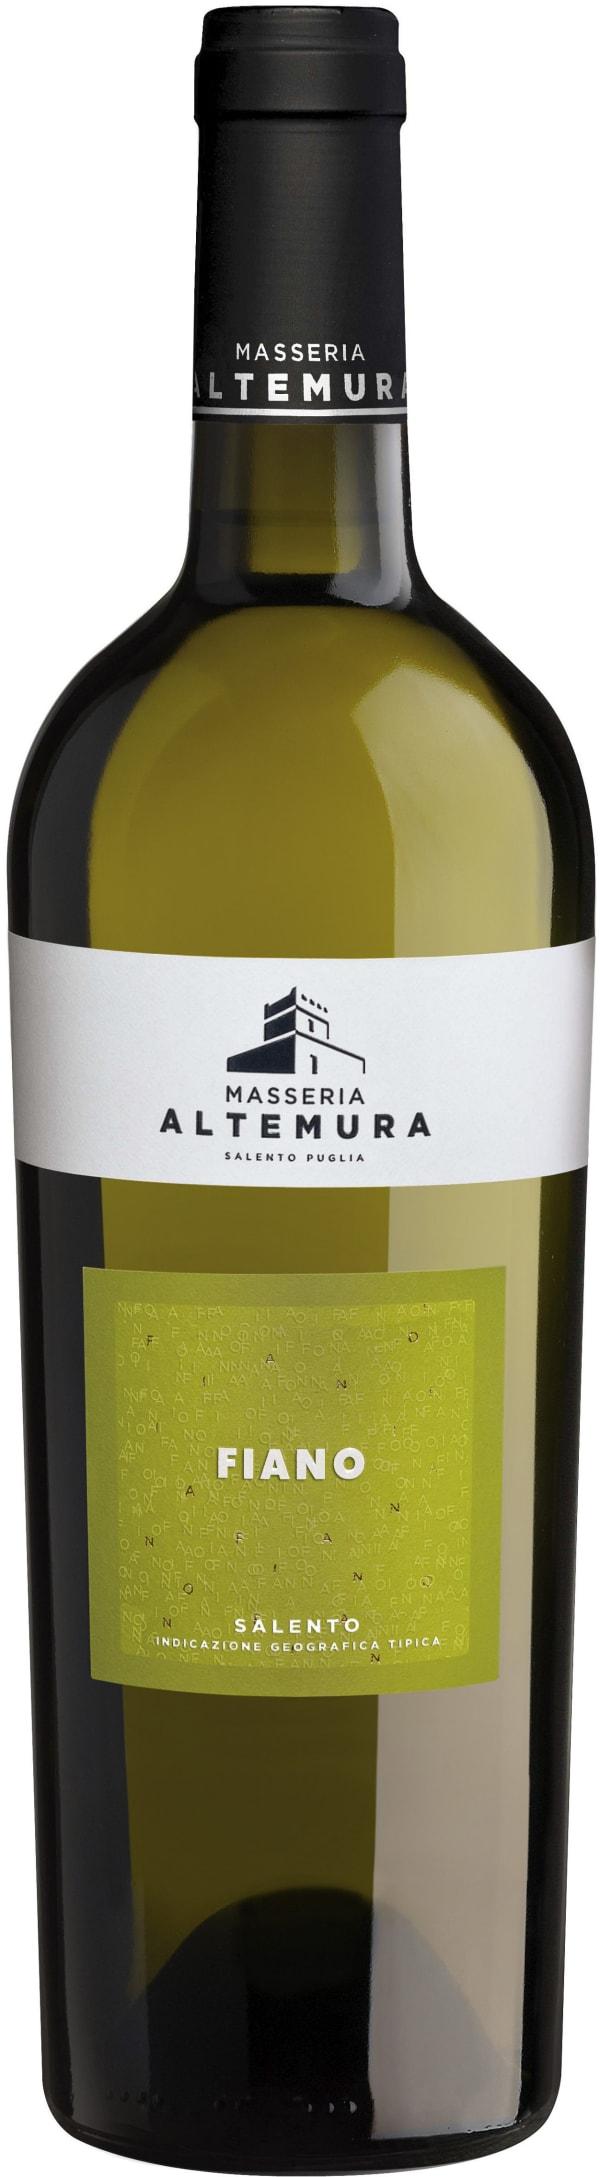 Masseria Altemura Fiano Salento 2018